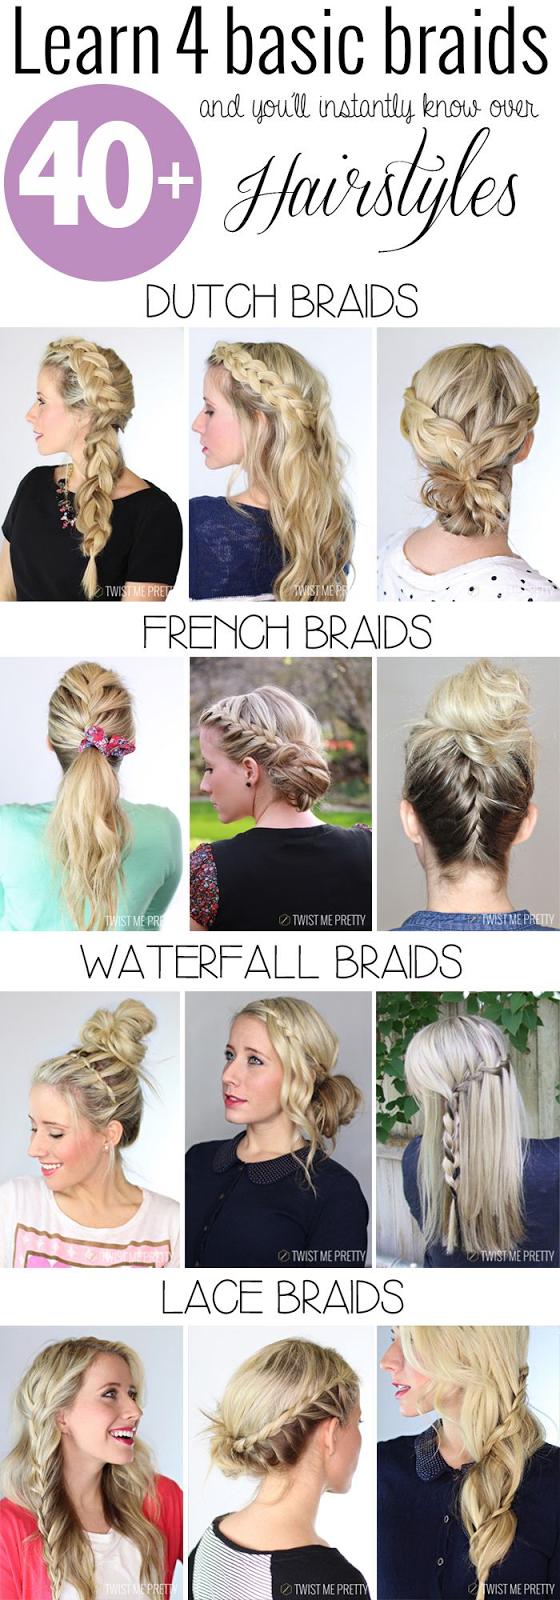 Learn Your 4 Basic Braids